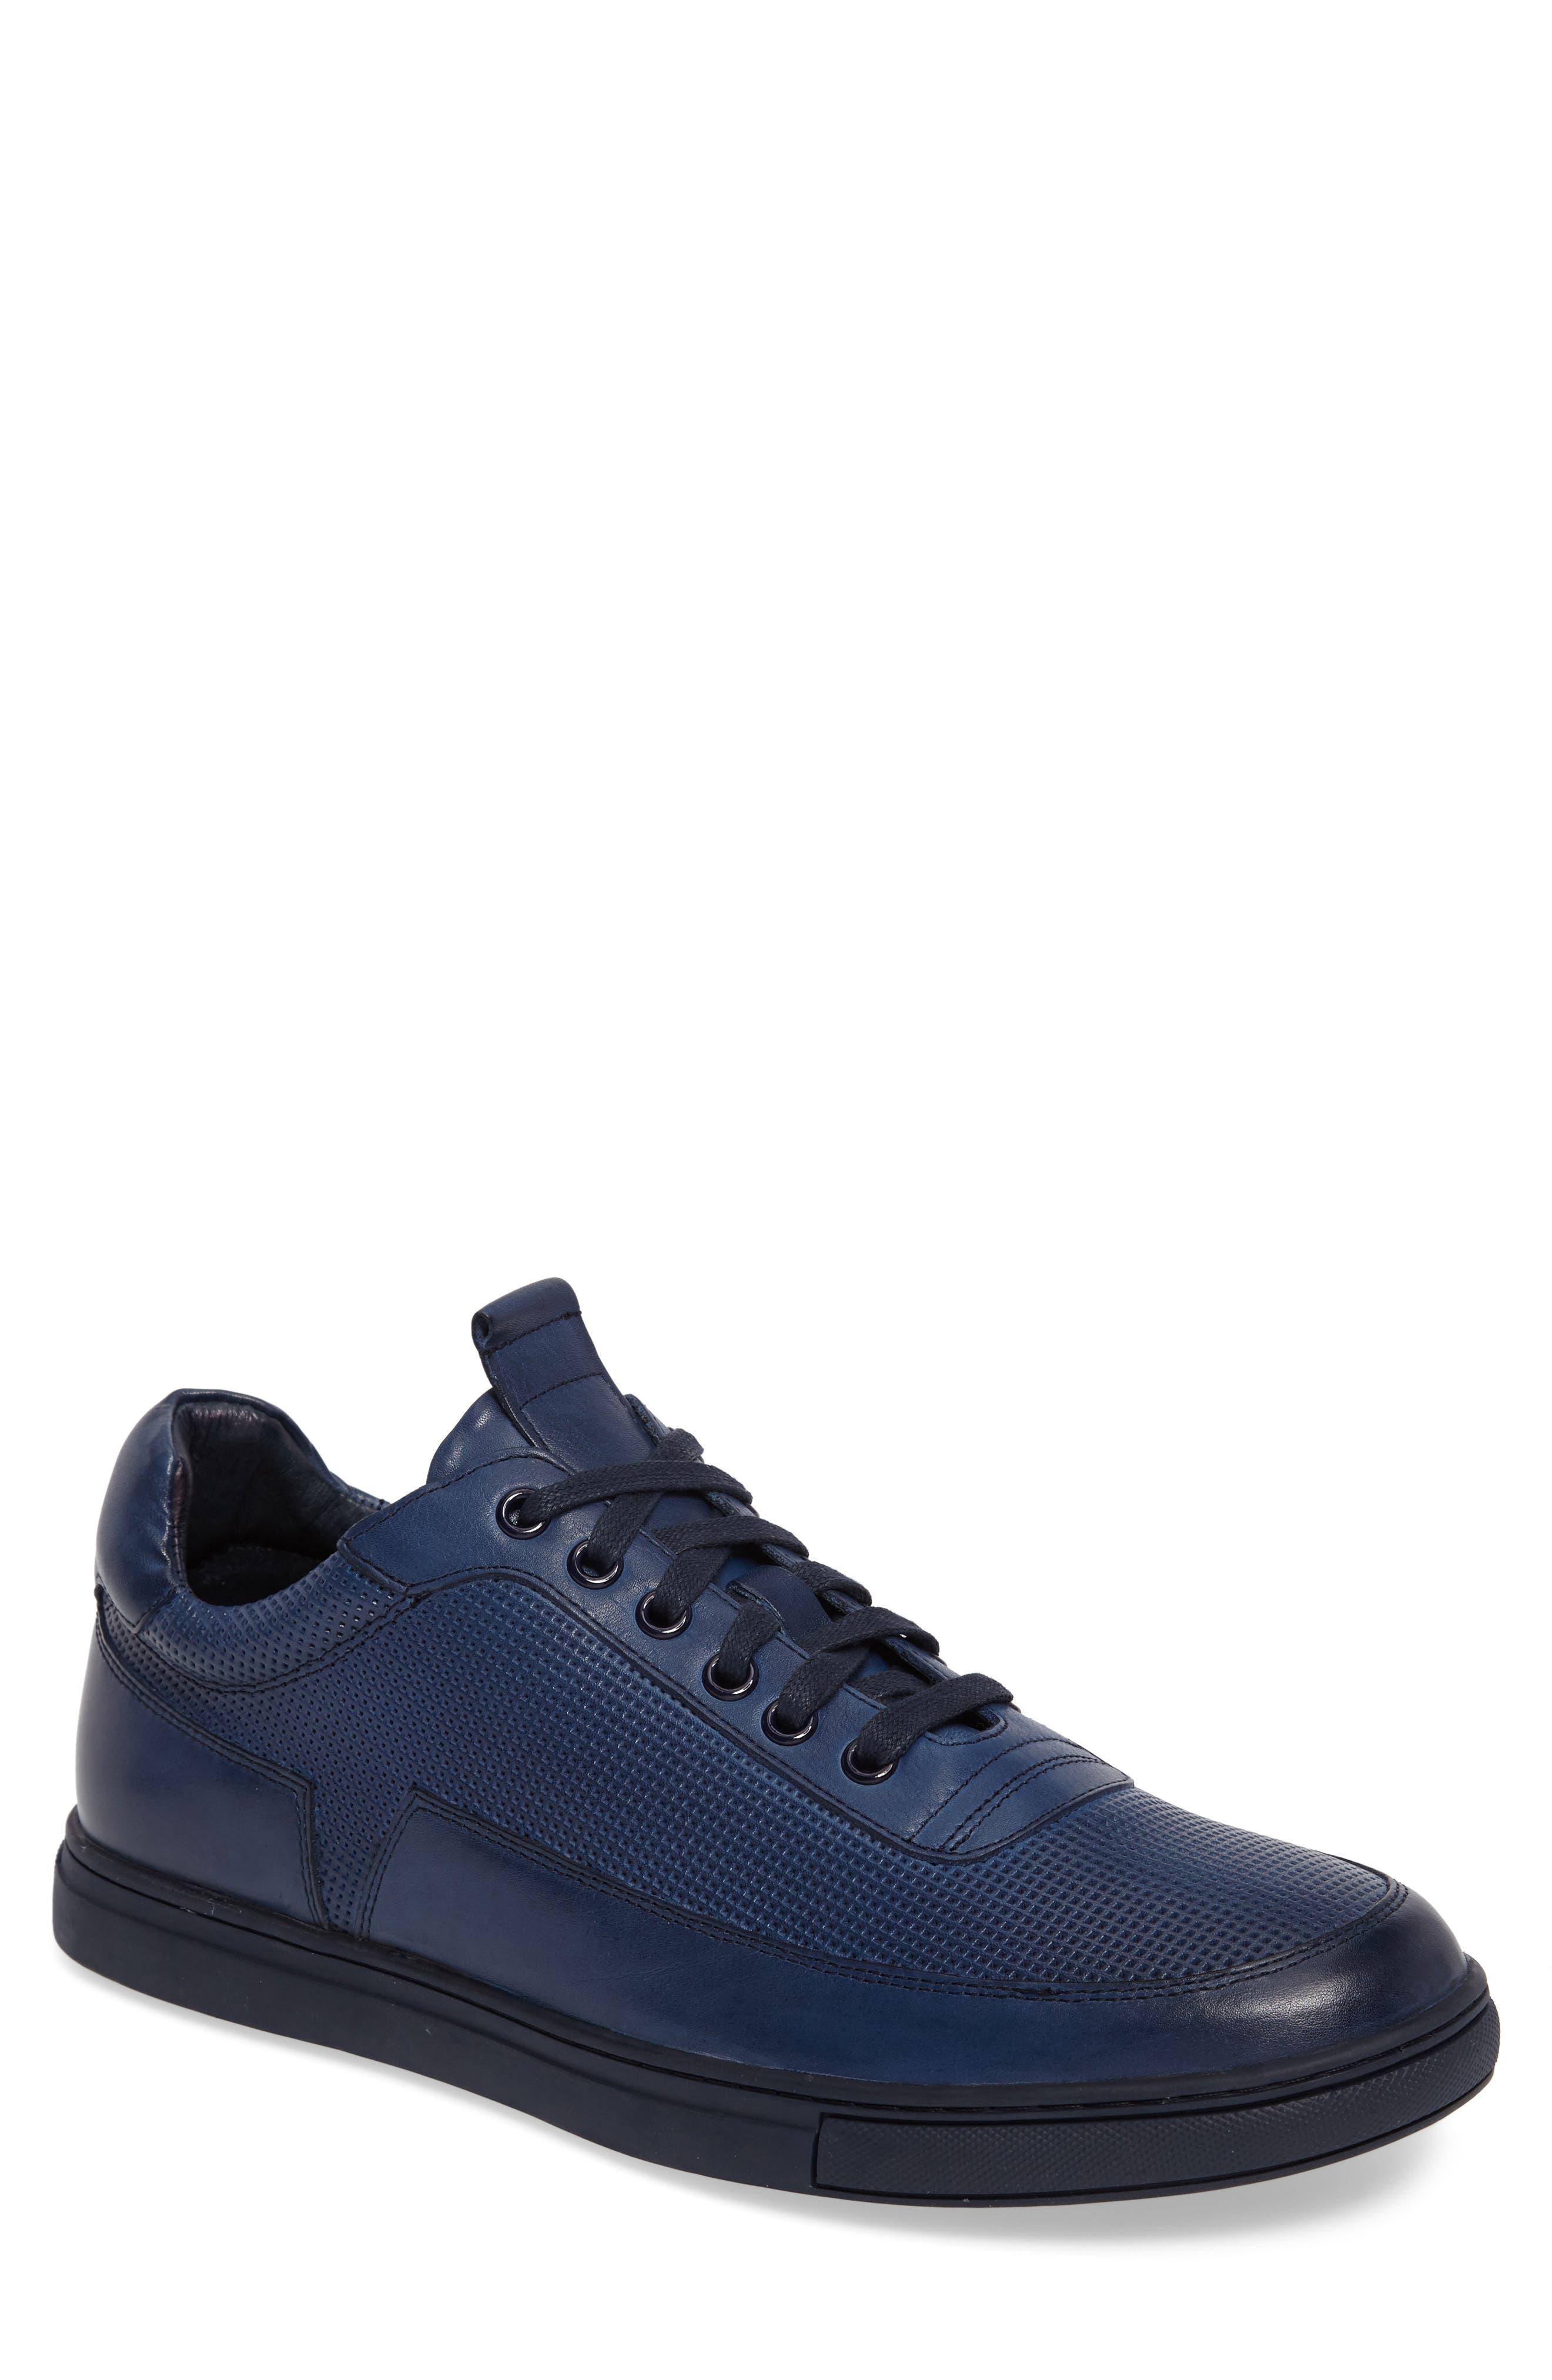 ZANZARA, Harmony Sneaker, Main thumbnail 1, color, BLUE LEATHER